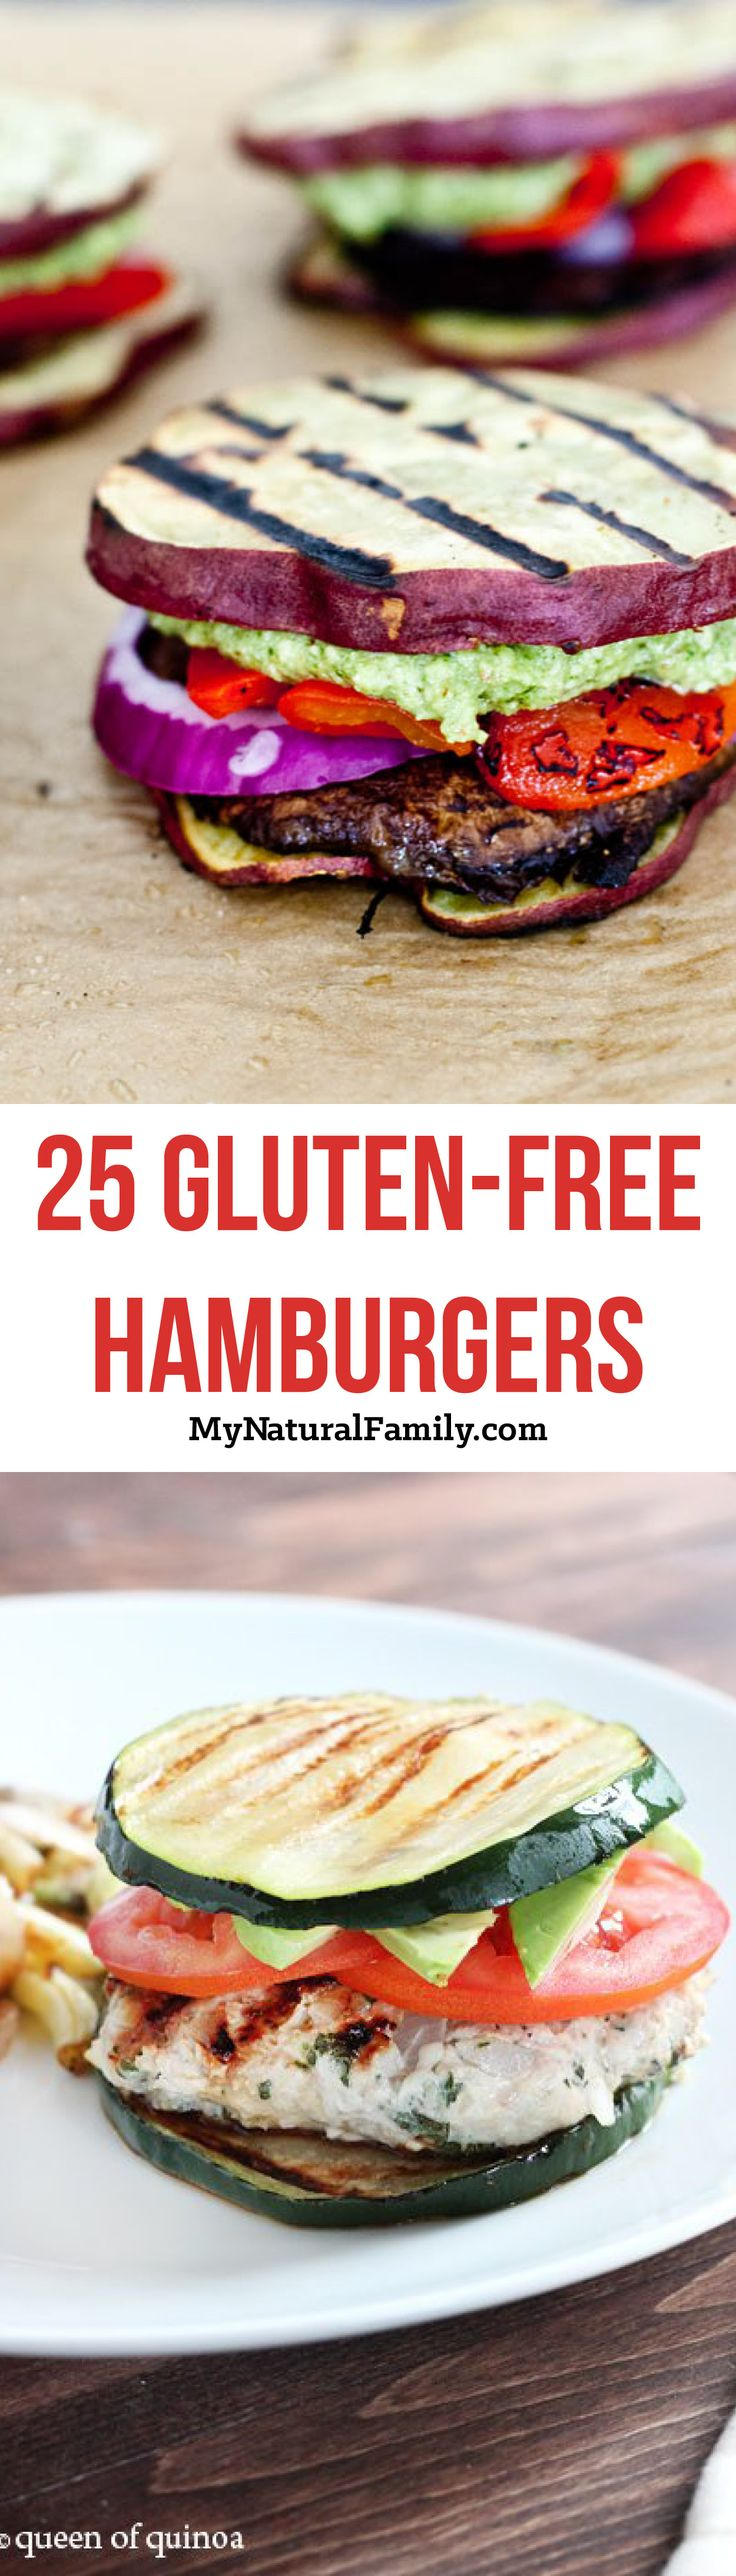 25 Gluten-Free Hamburger Bun and No-Bun Recipes that Actually Taste Good!   My Natural Family